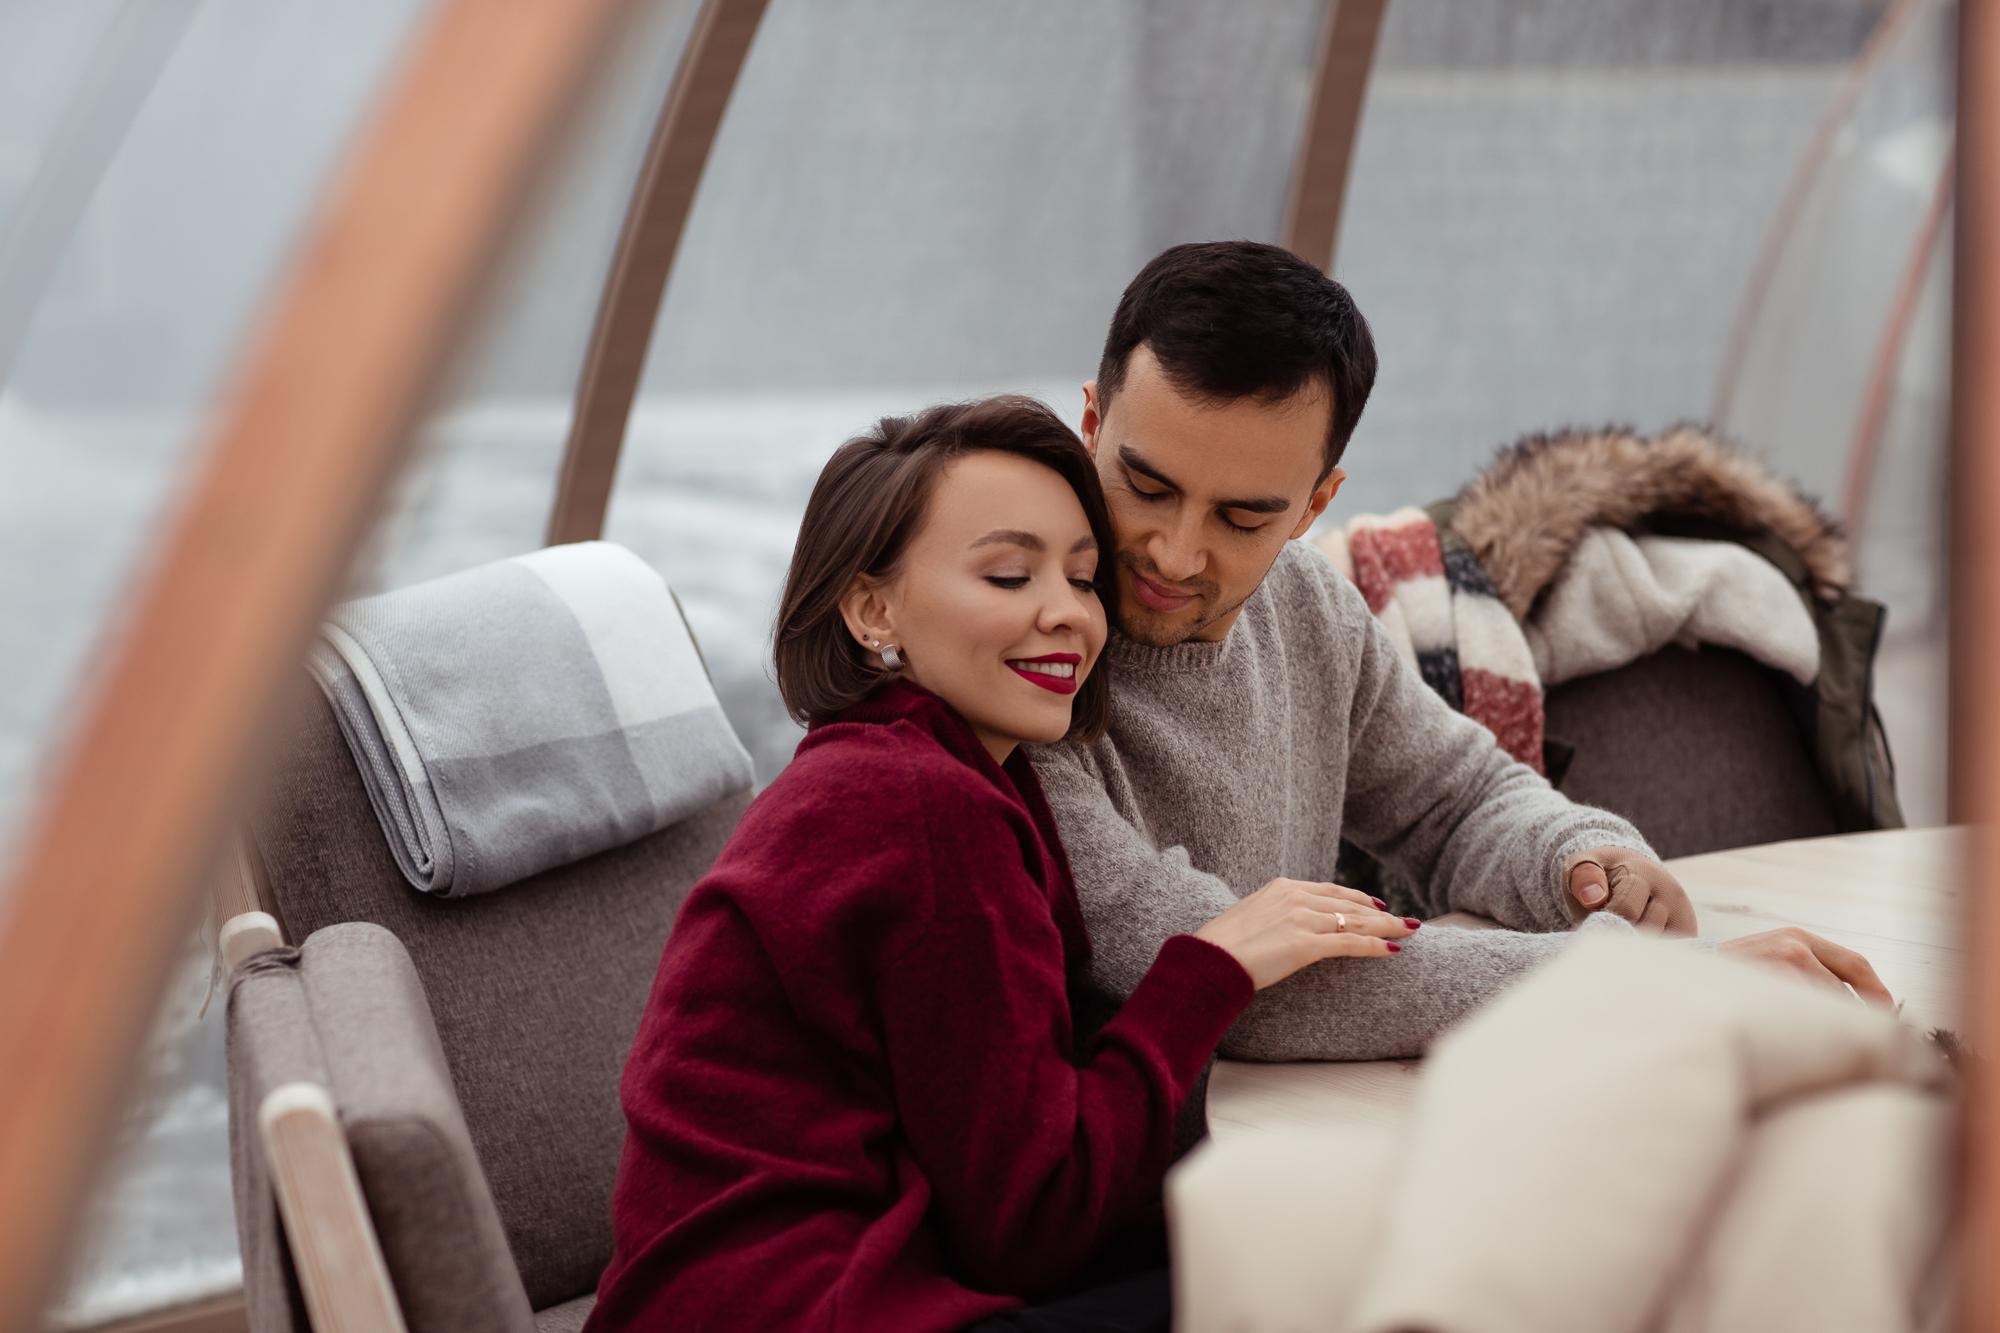 Вика и Тимур, Love Story, г. Москва